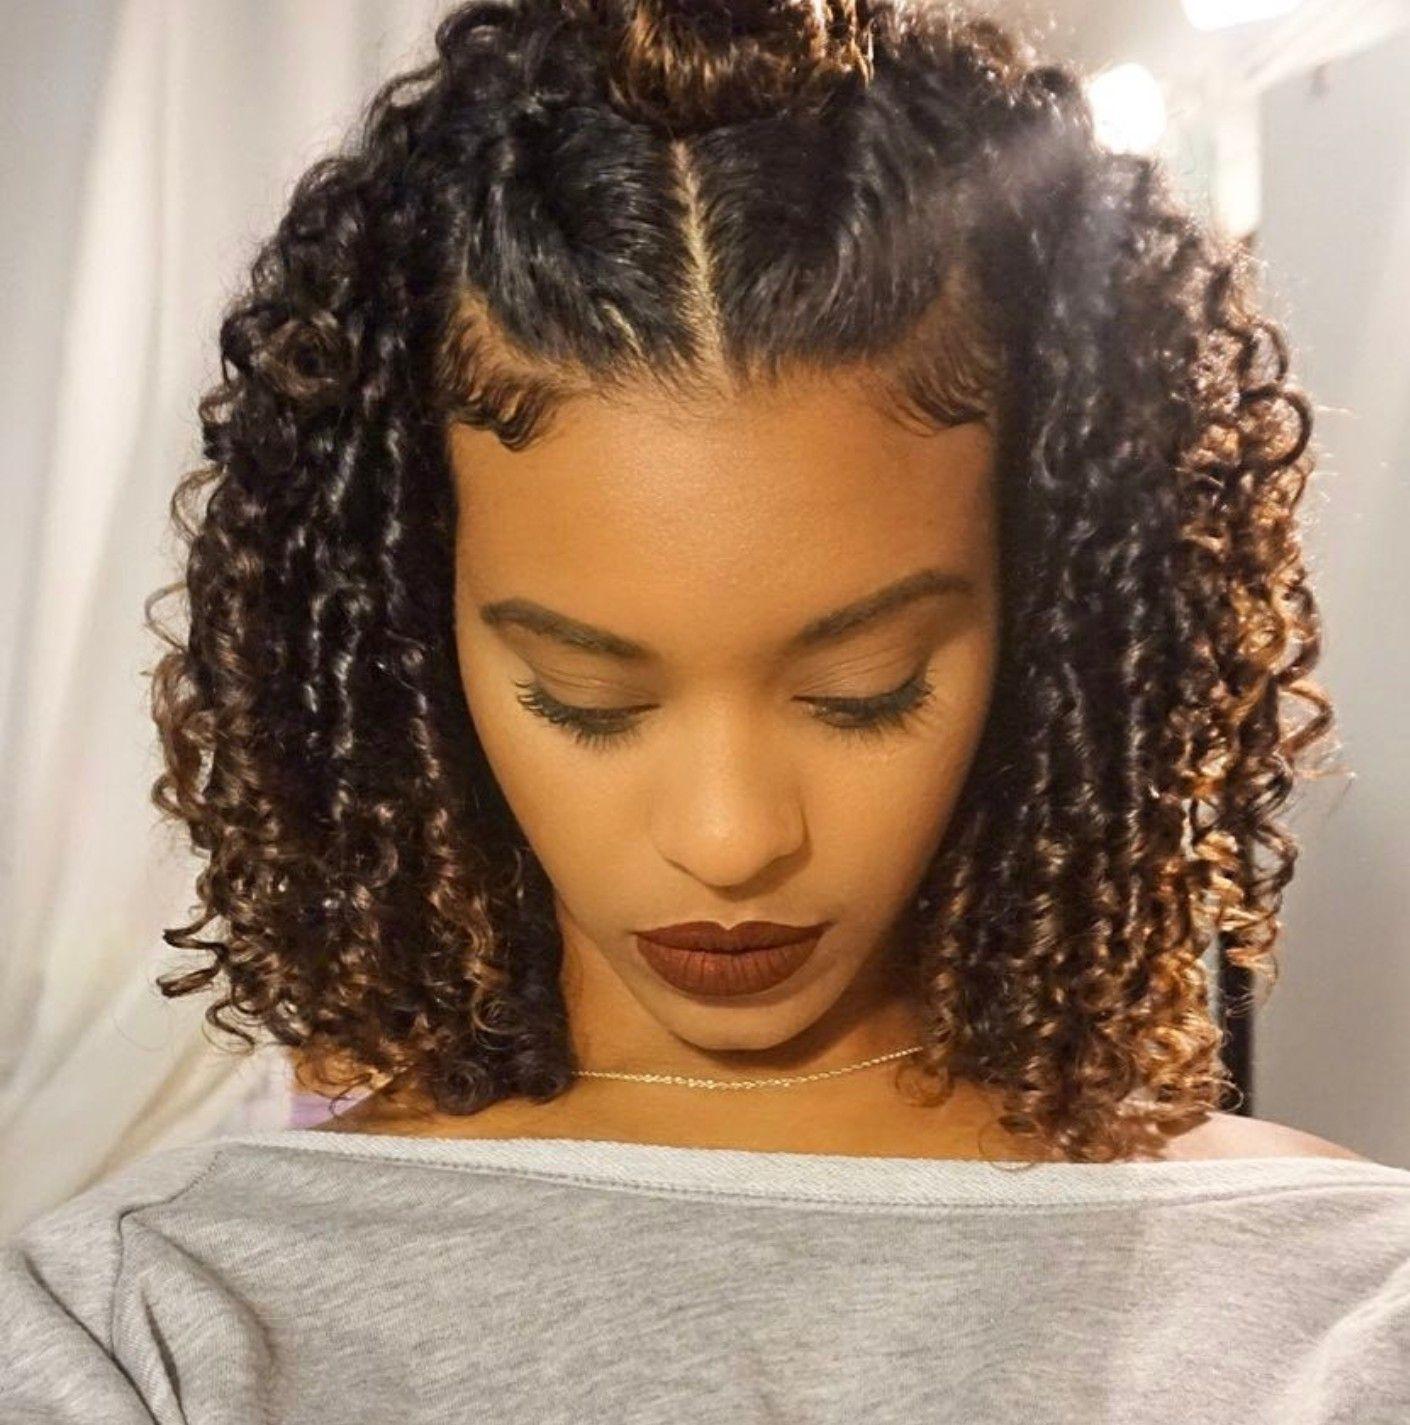 Pin by Arlene LaRocque on curly hair Pinterest